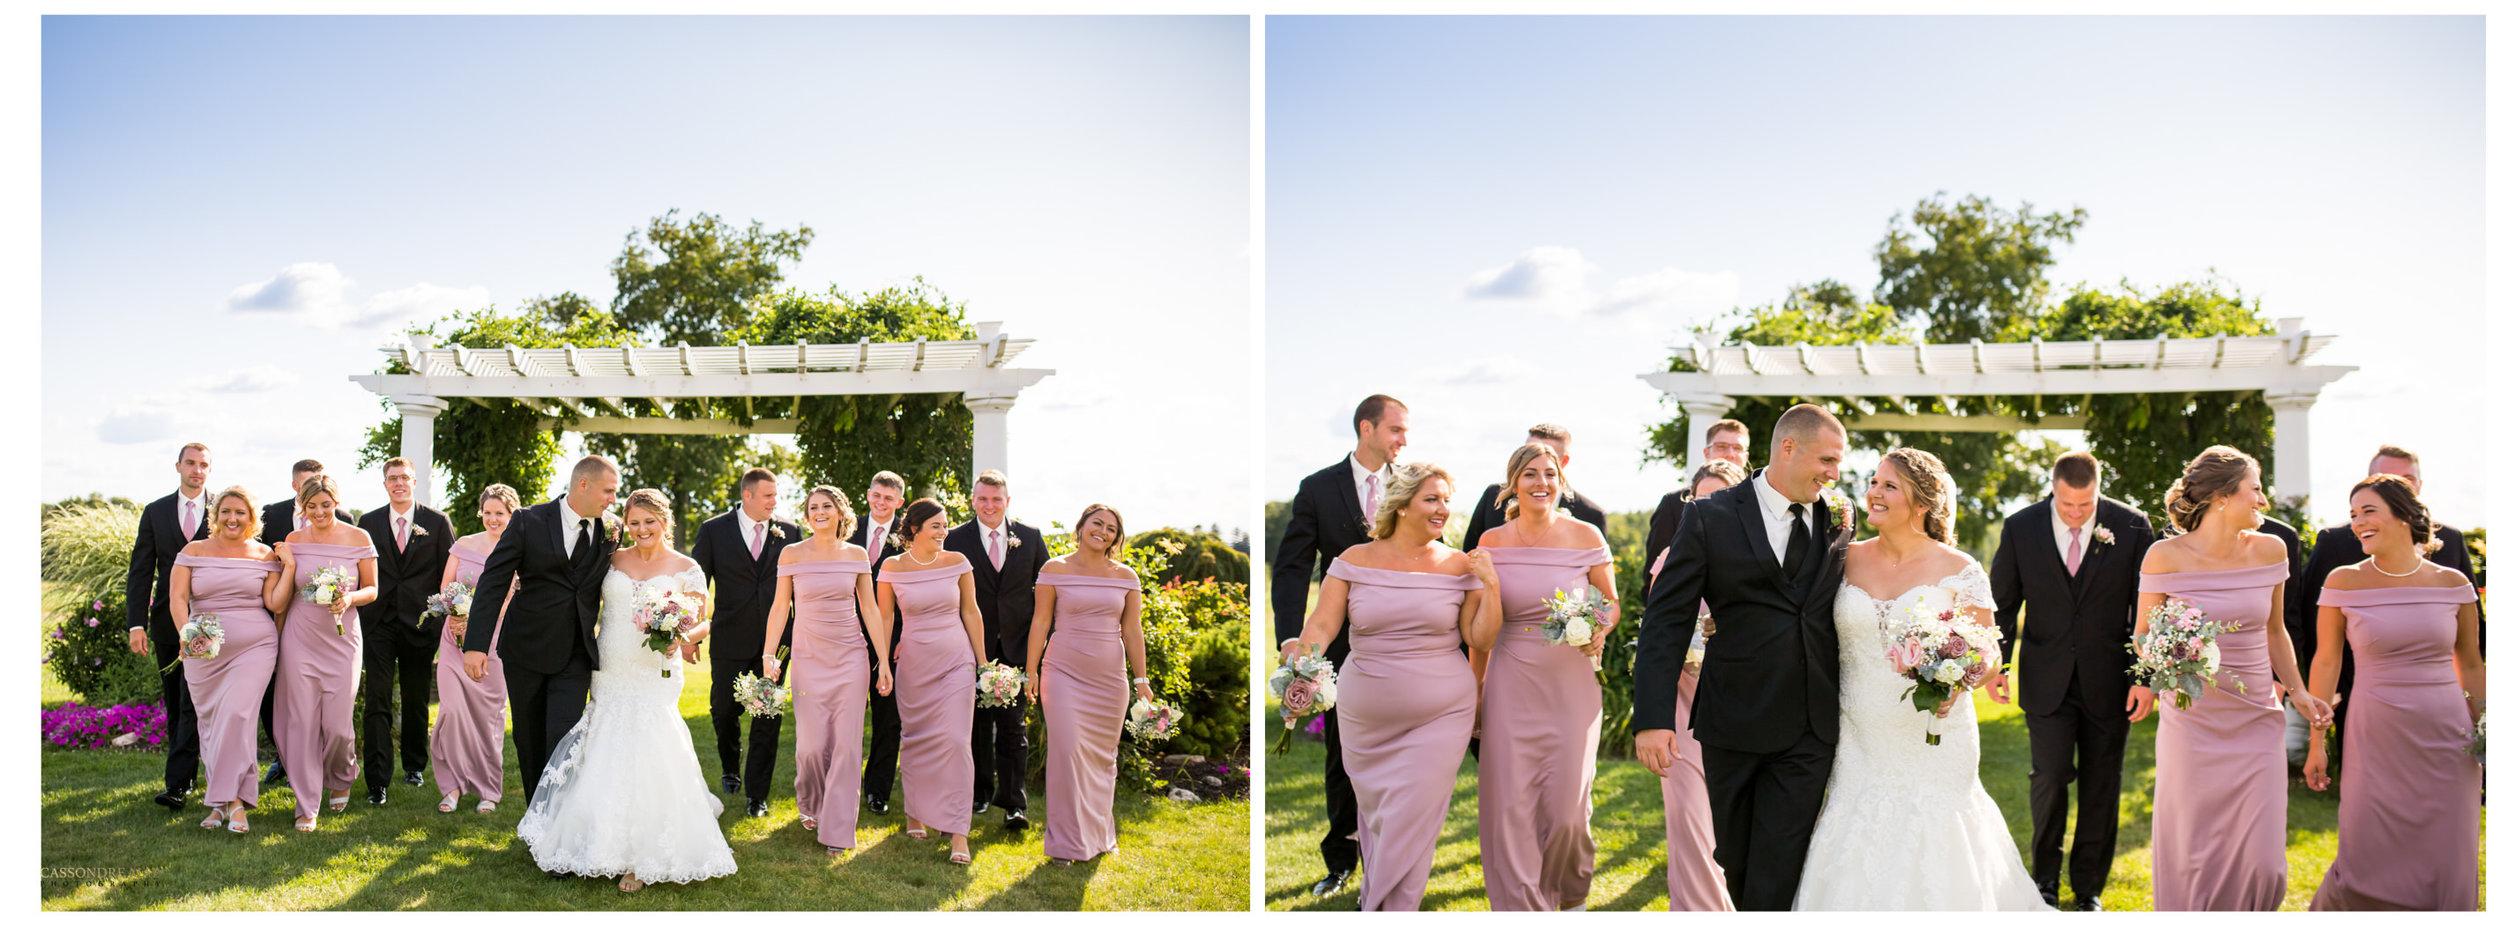 Cassondre Mae Photography The Links Wedding Photographer 14.jpg